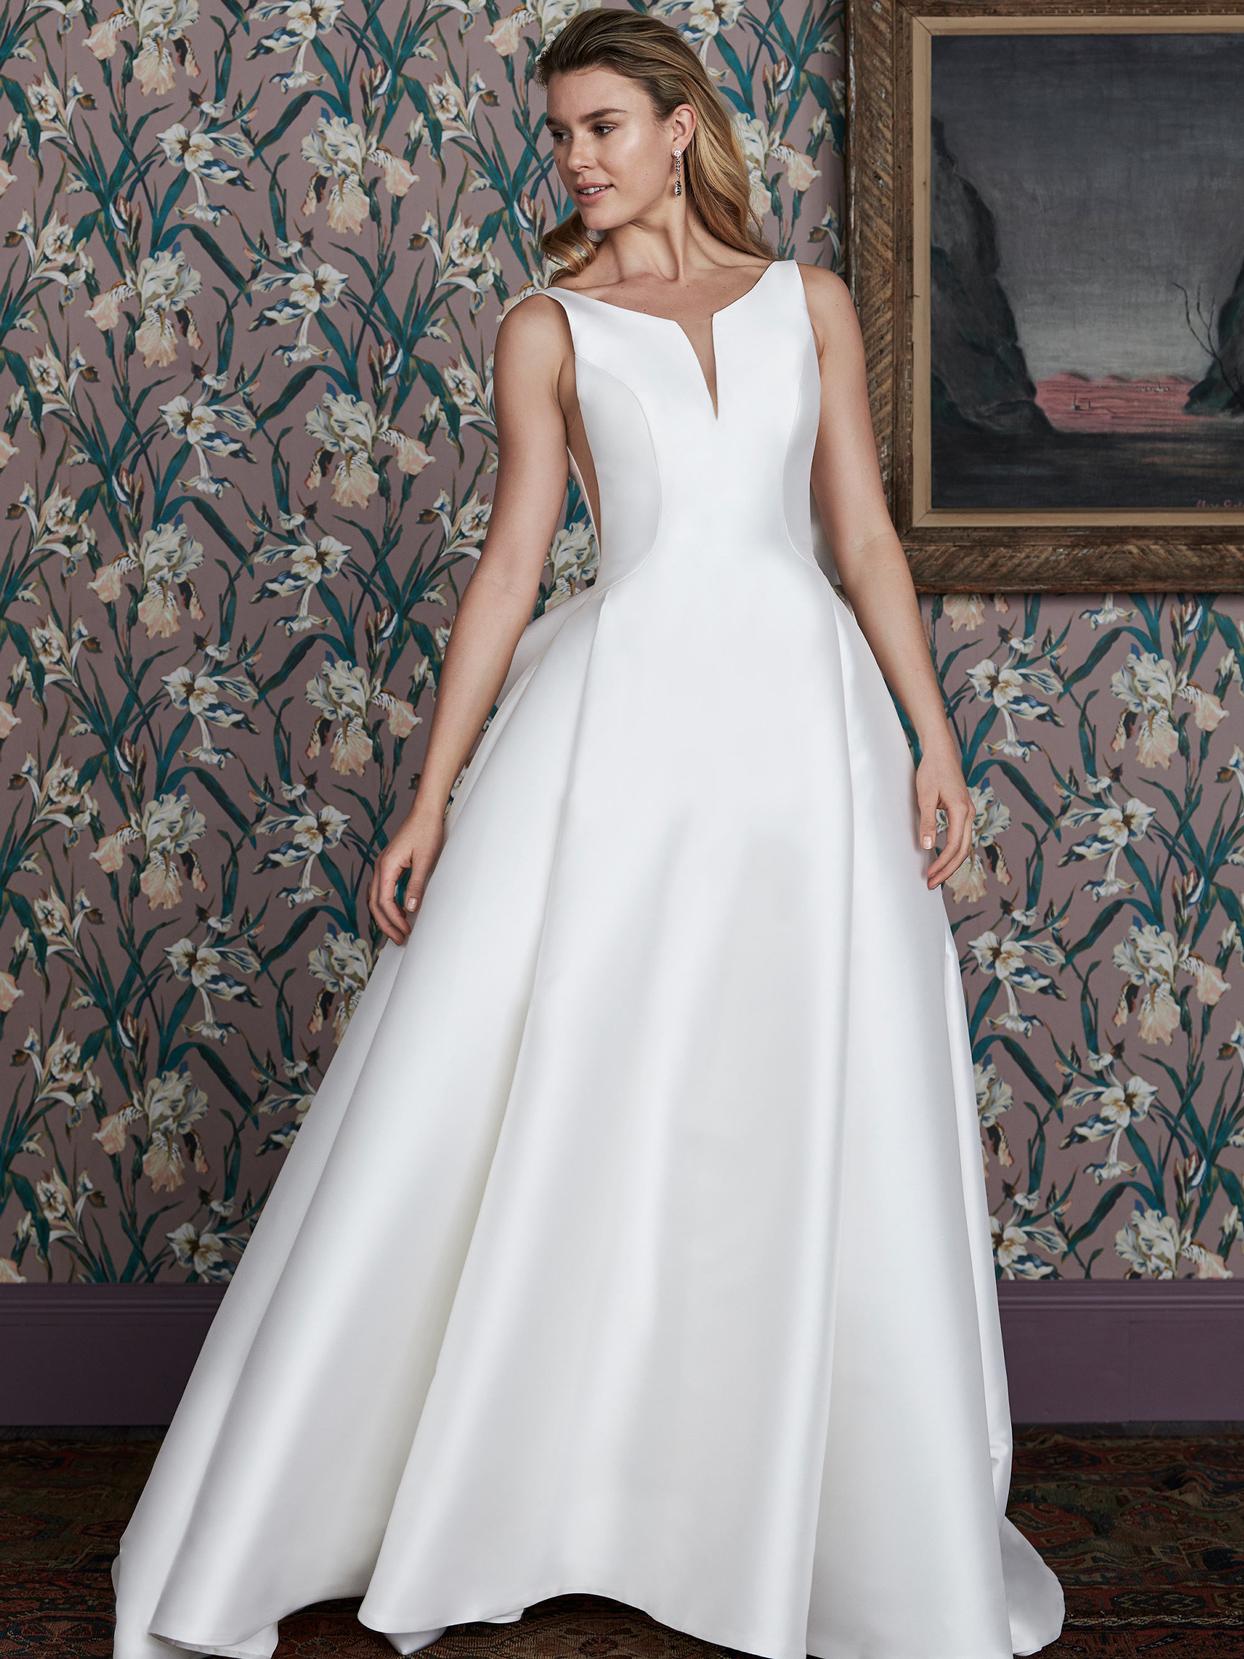 justin alexander v-neck sleeveless wedding dress spring 2021